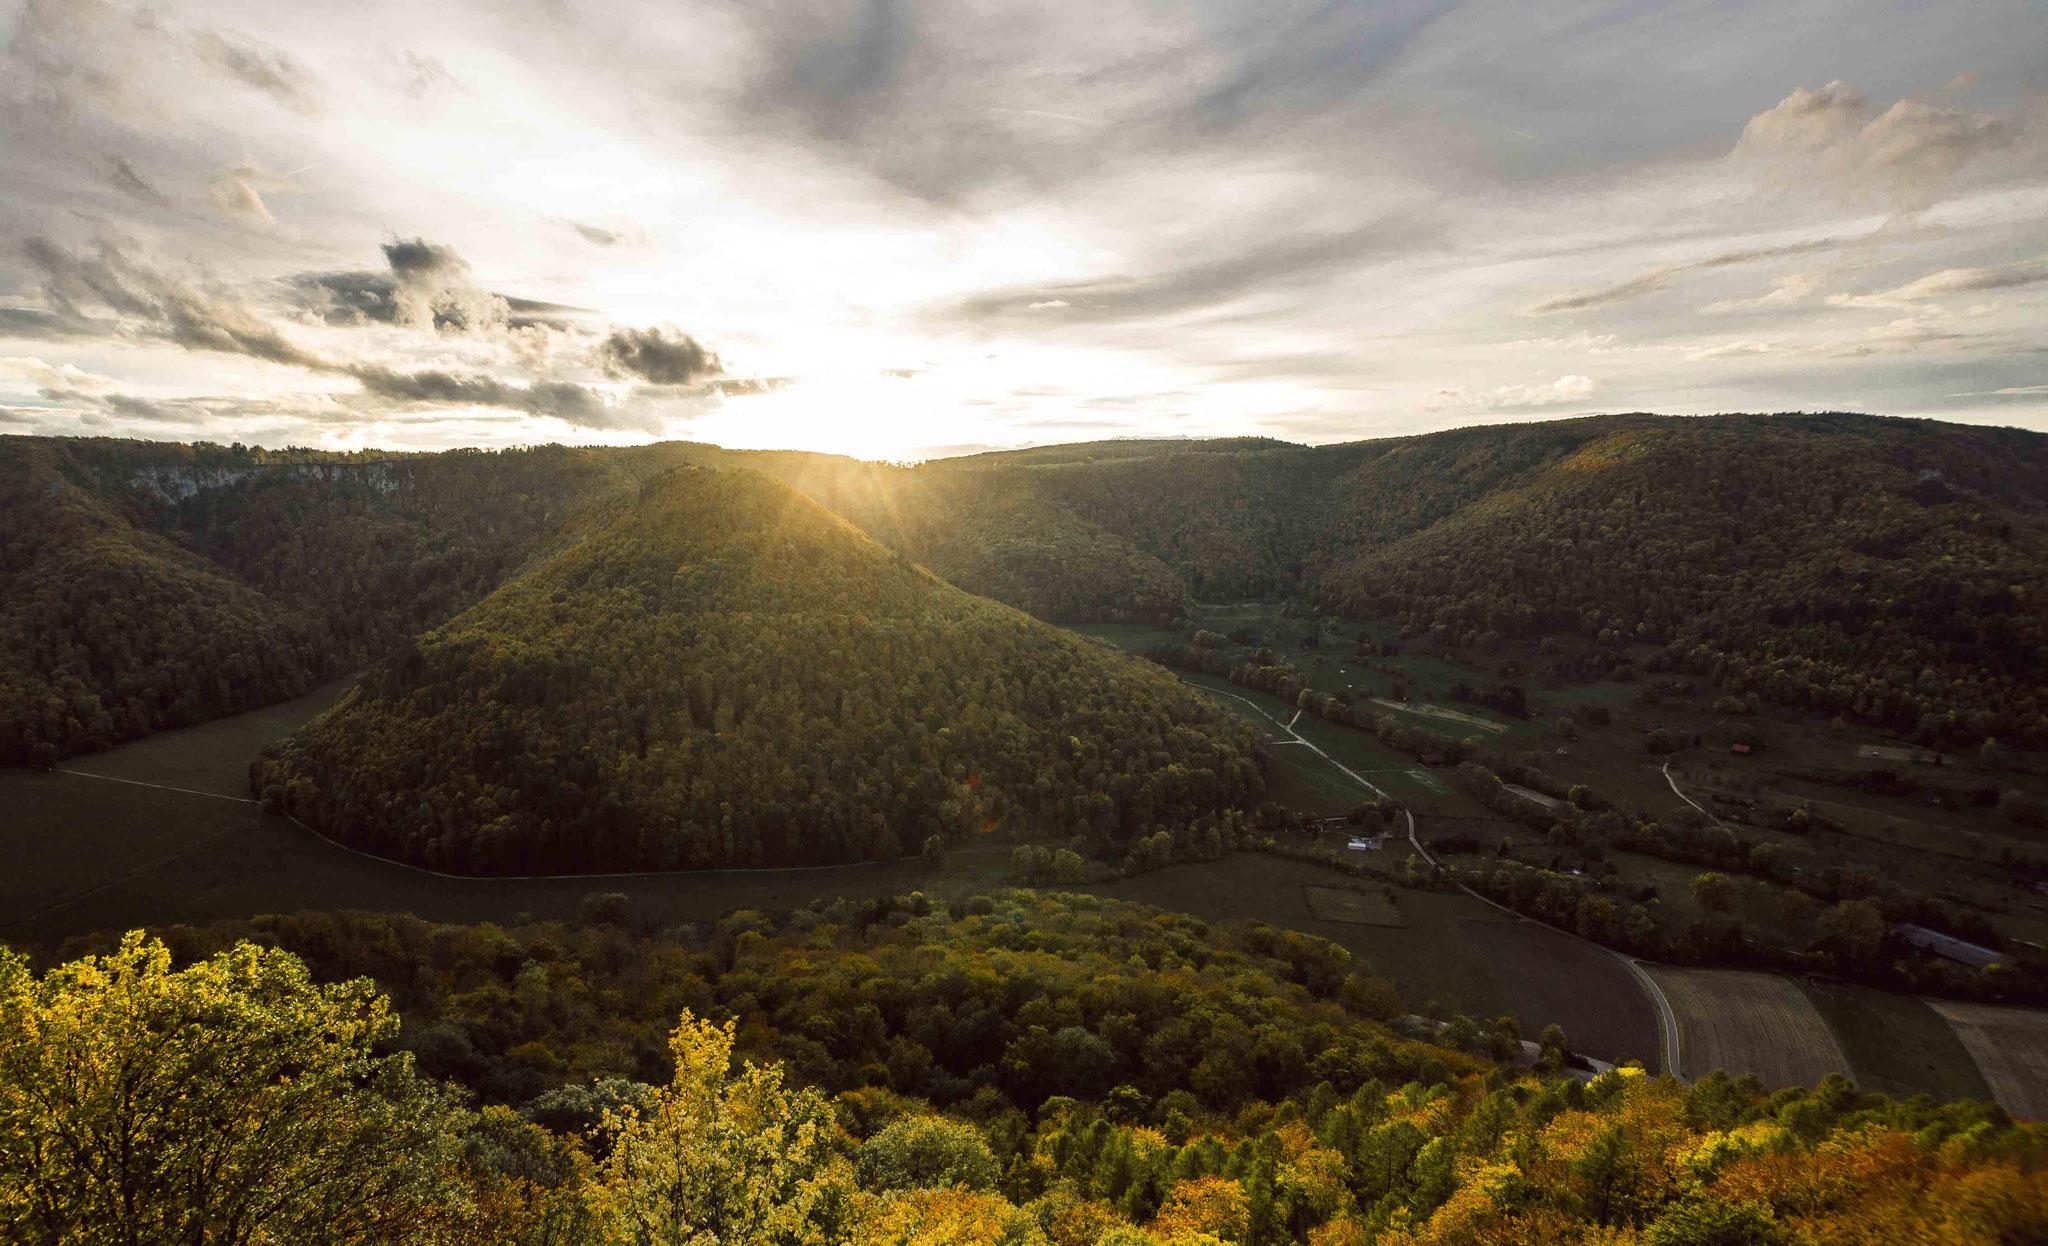 Goldener Wald; Burg Ruine Hohen Urach